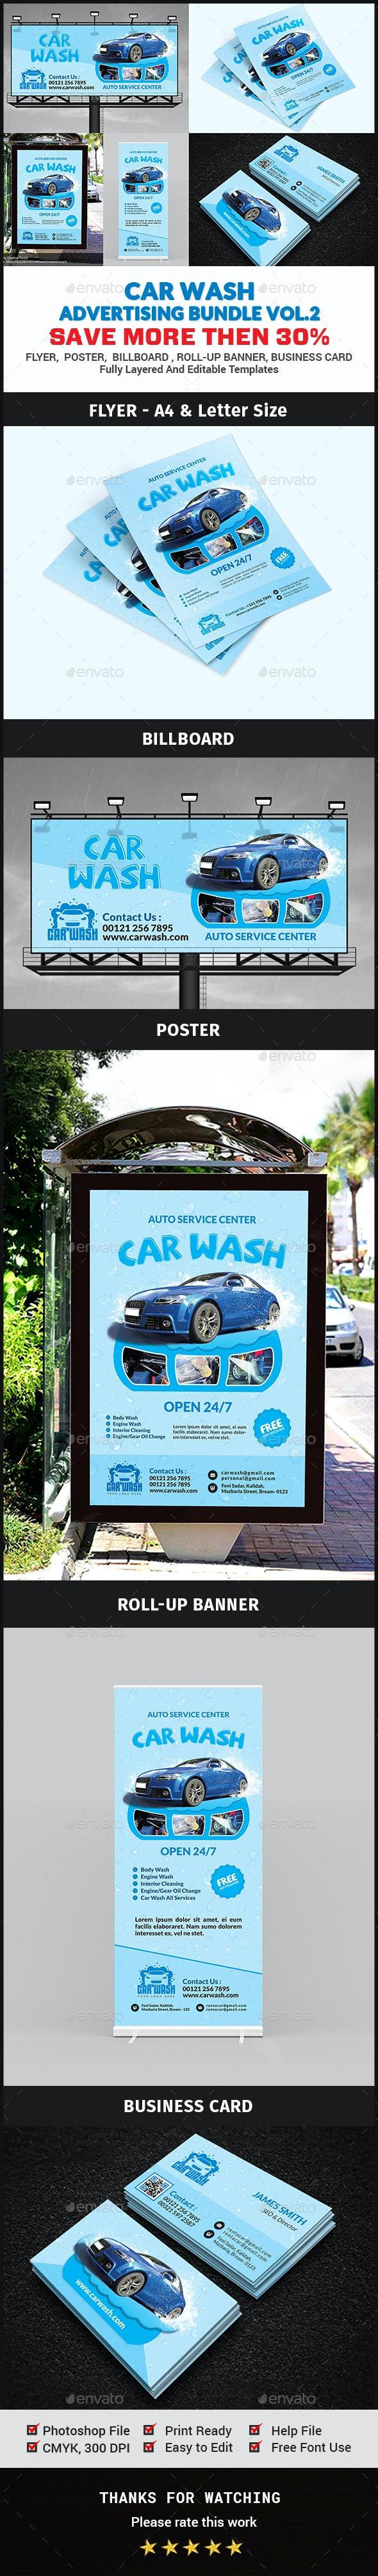 Car Wash Advertising Bundle Vol.2 - Signage Print Templates